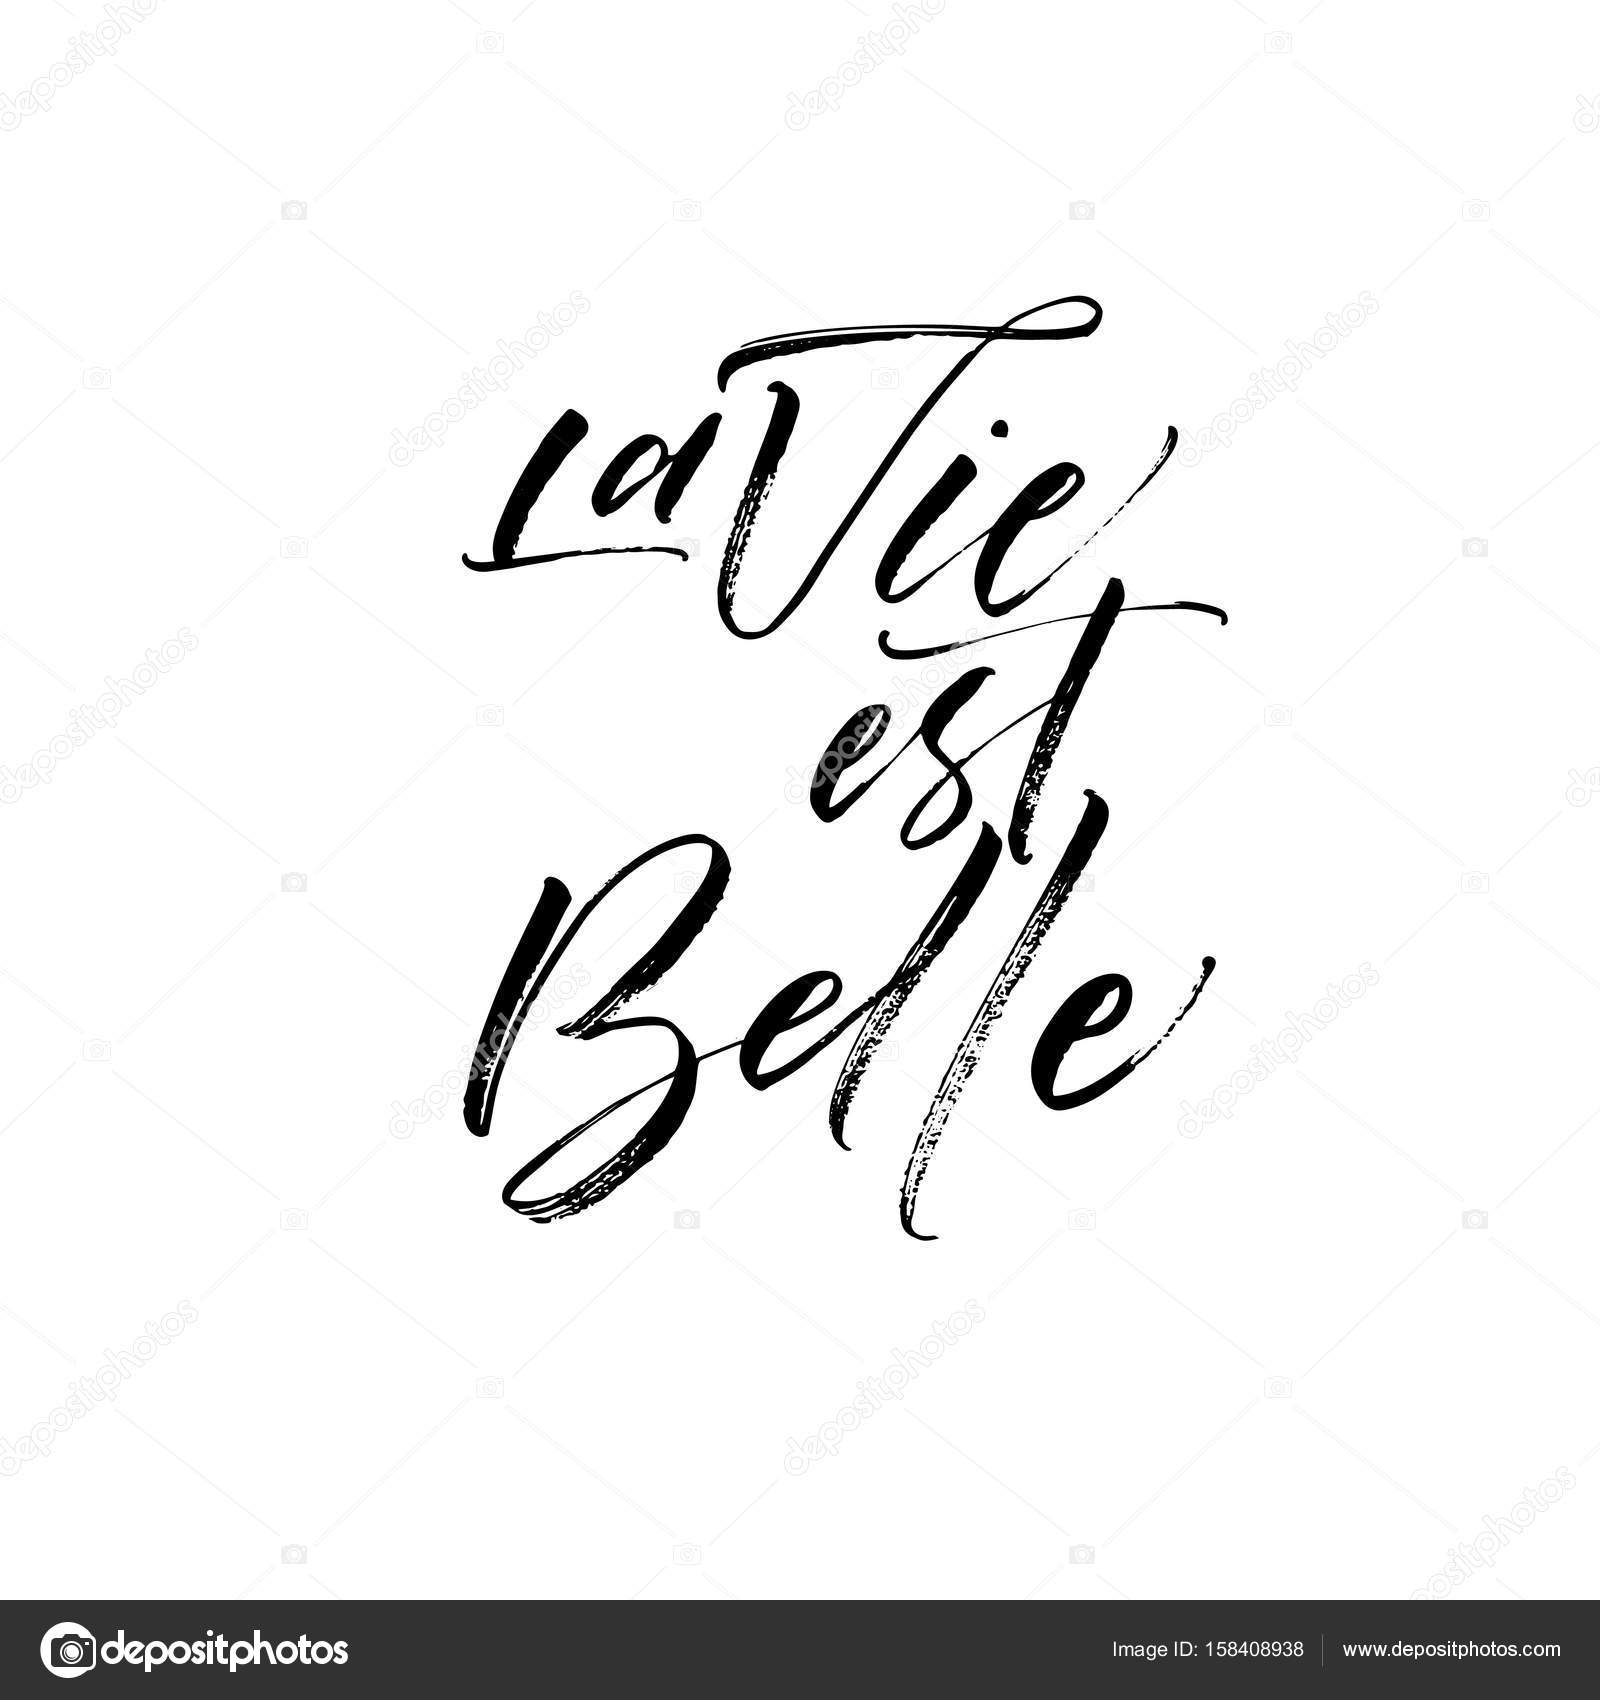 La Vie Est Bell Phrase векторное изображение Gevko93